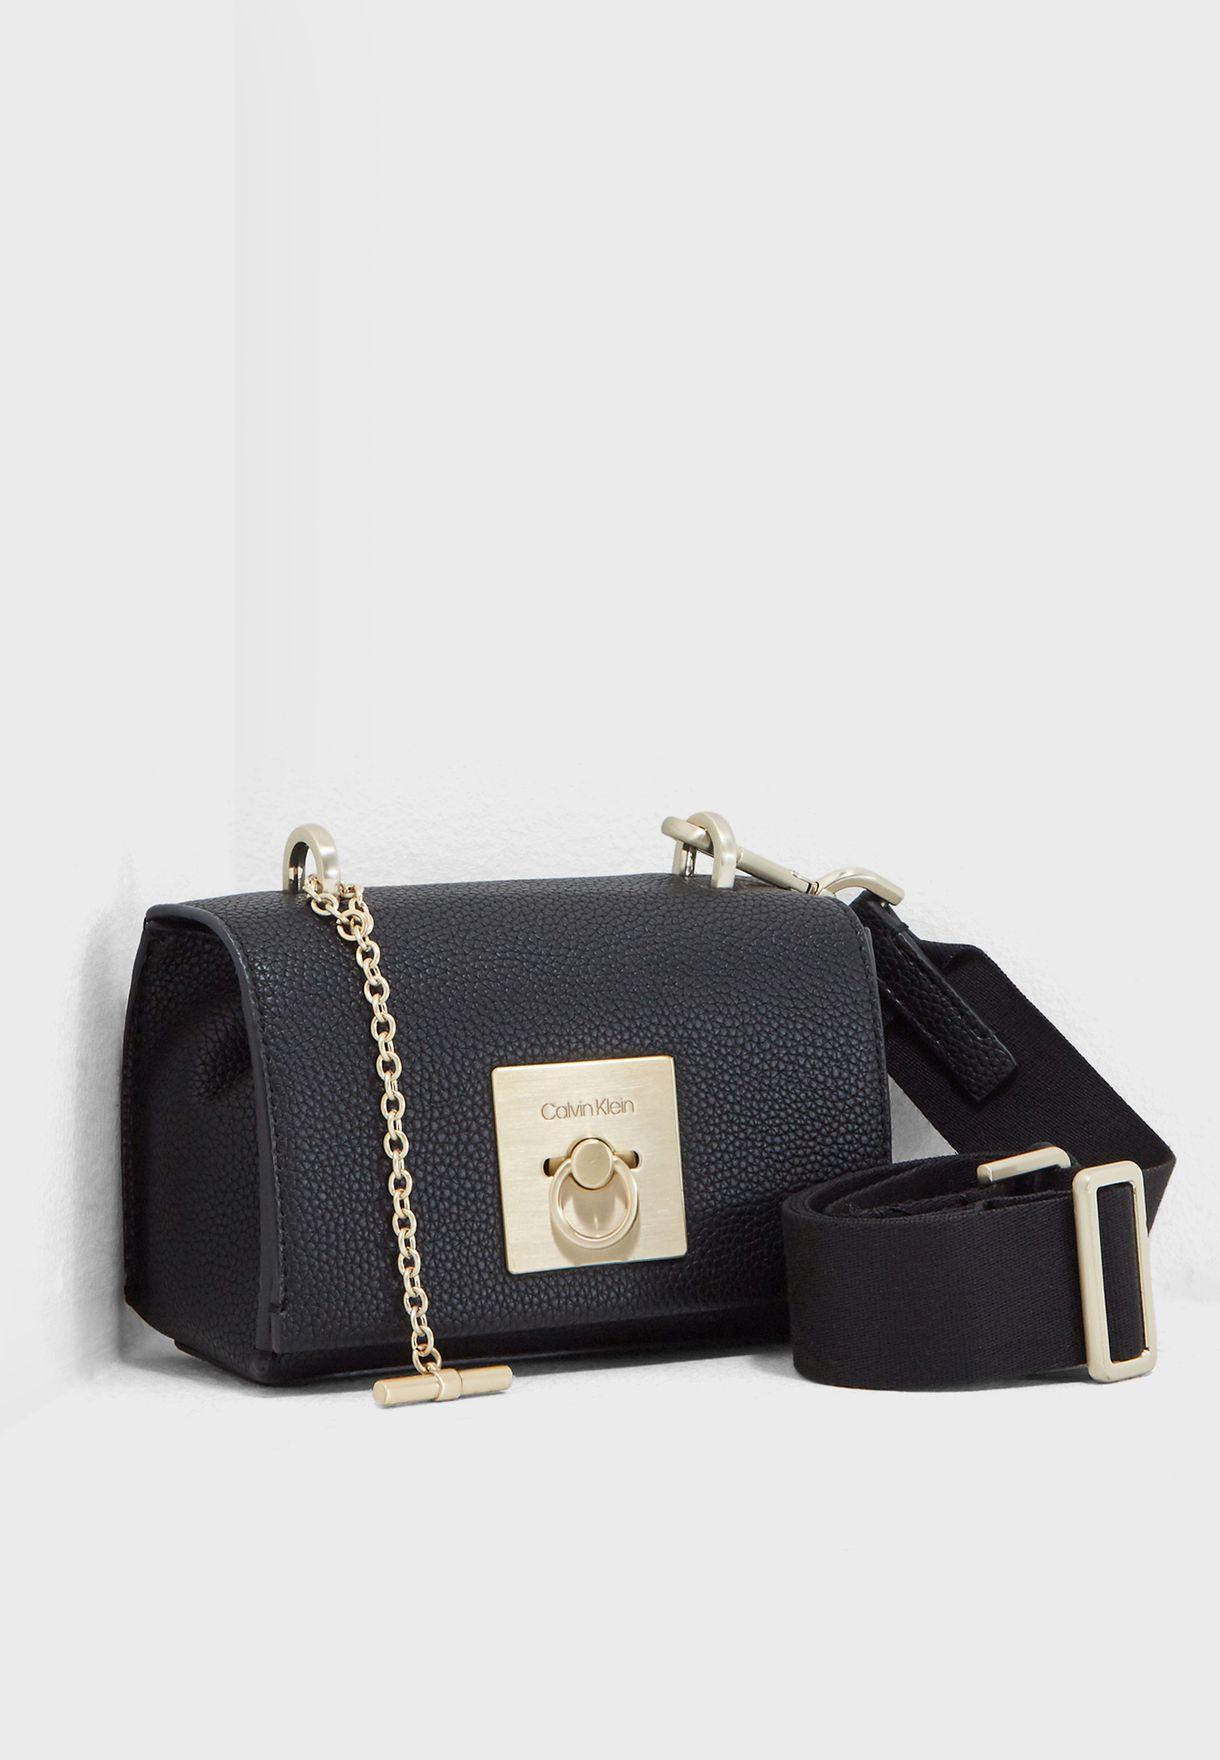 e1bb2356a43 Shop Calvin Klein black Lock Flap Small Crossbody K60K604888 for ...